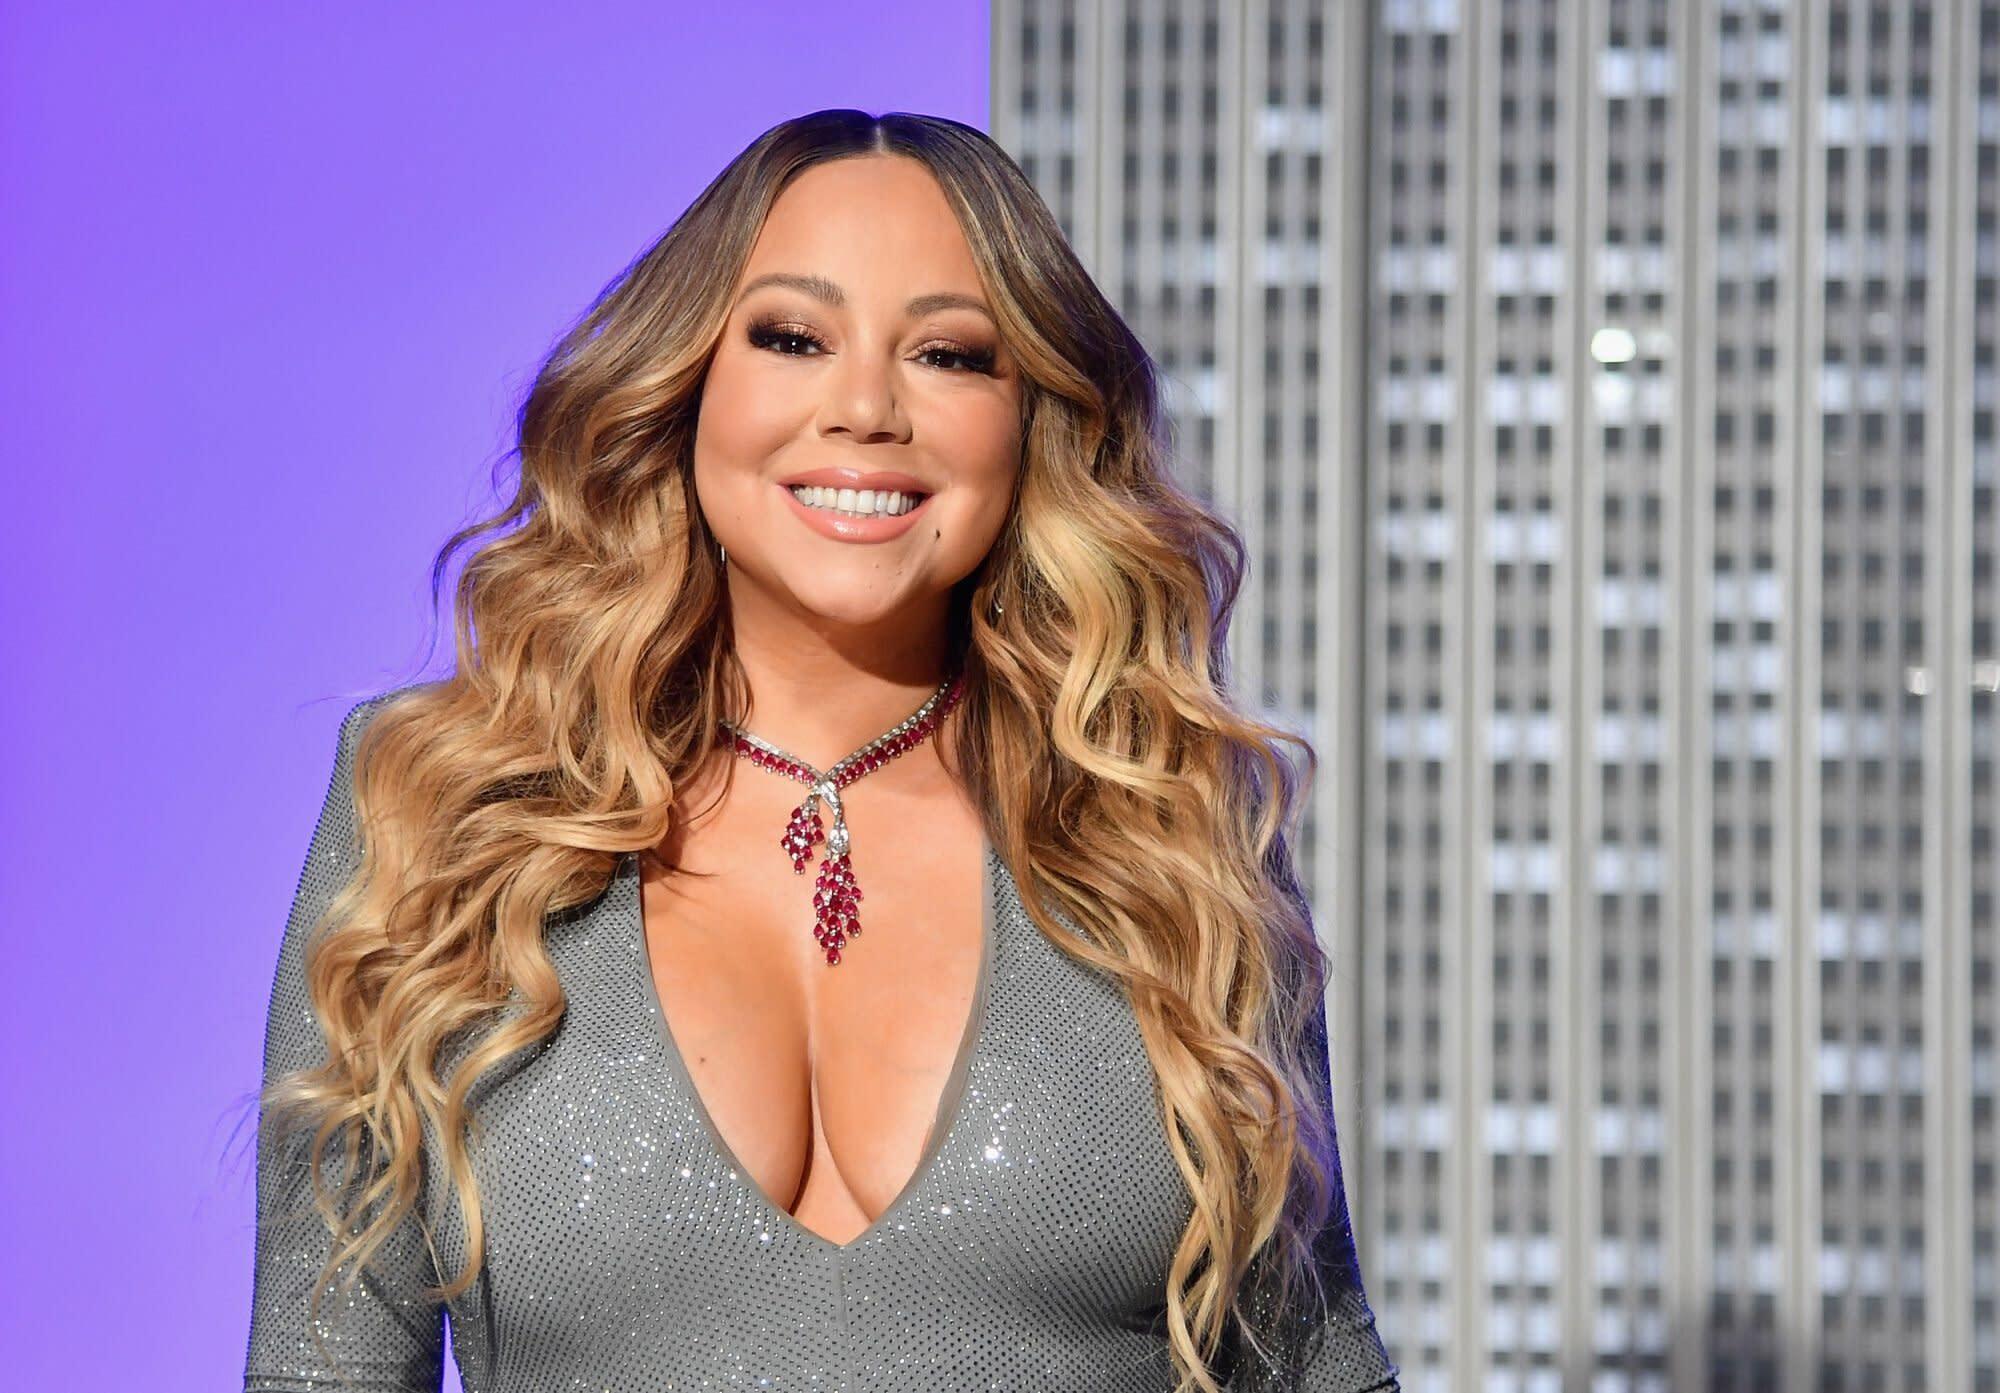 Mariah Carey S Hair Has Been Looking Very 90s Lately